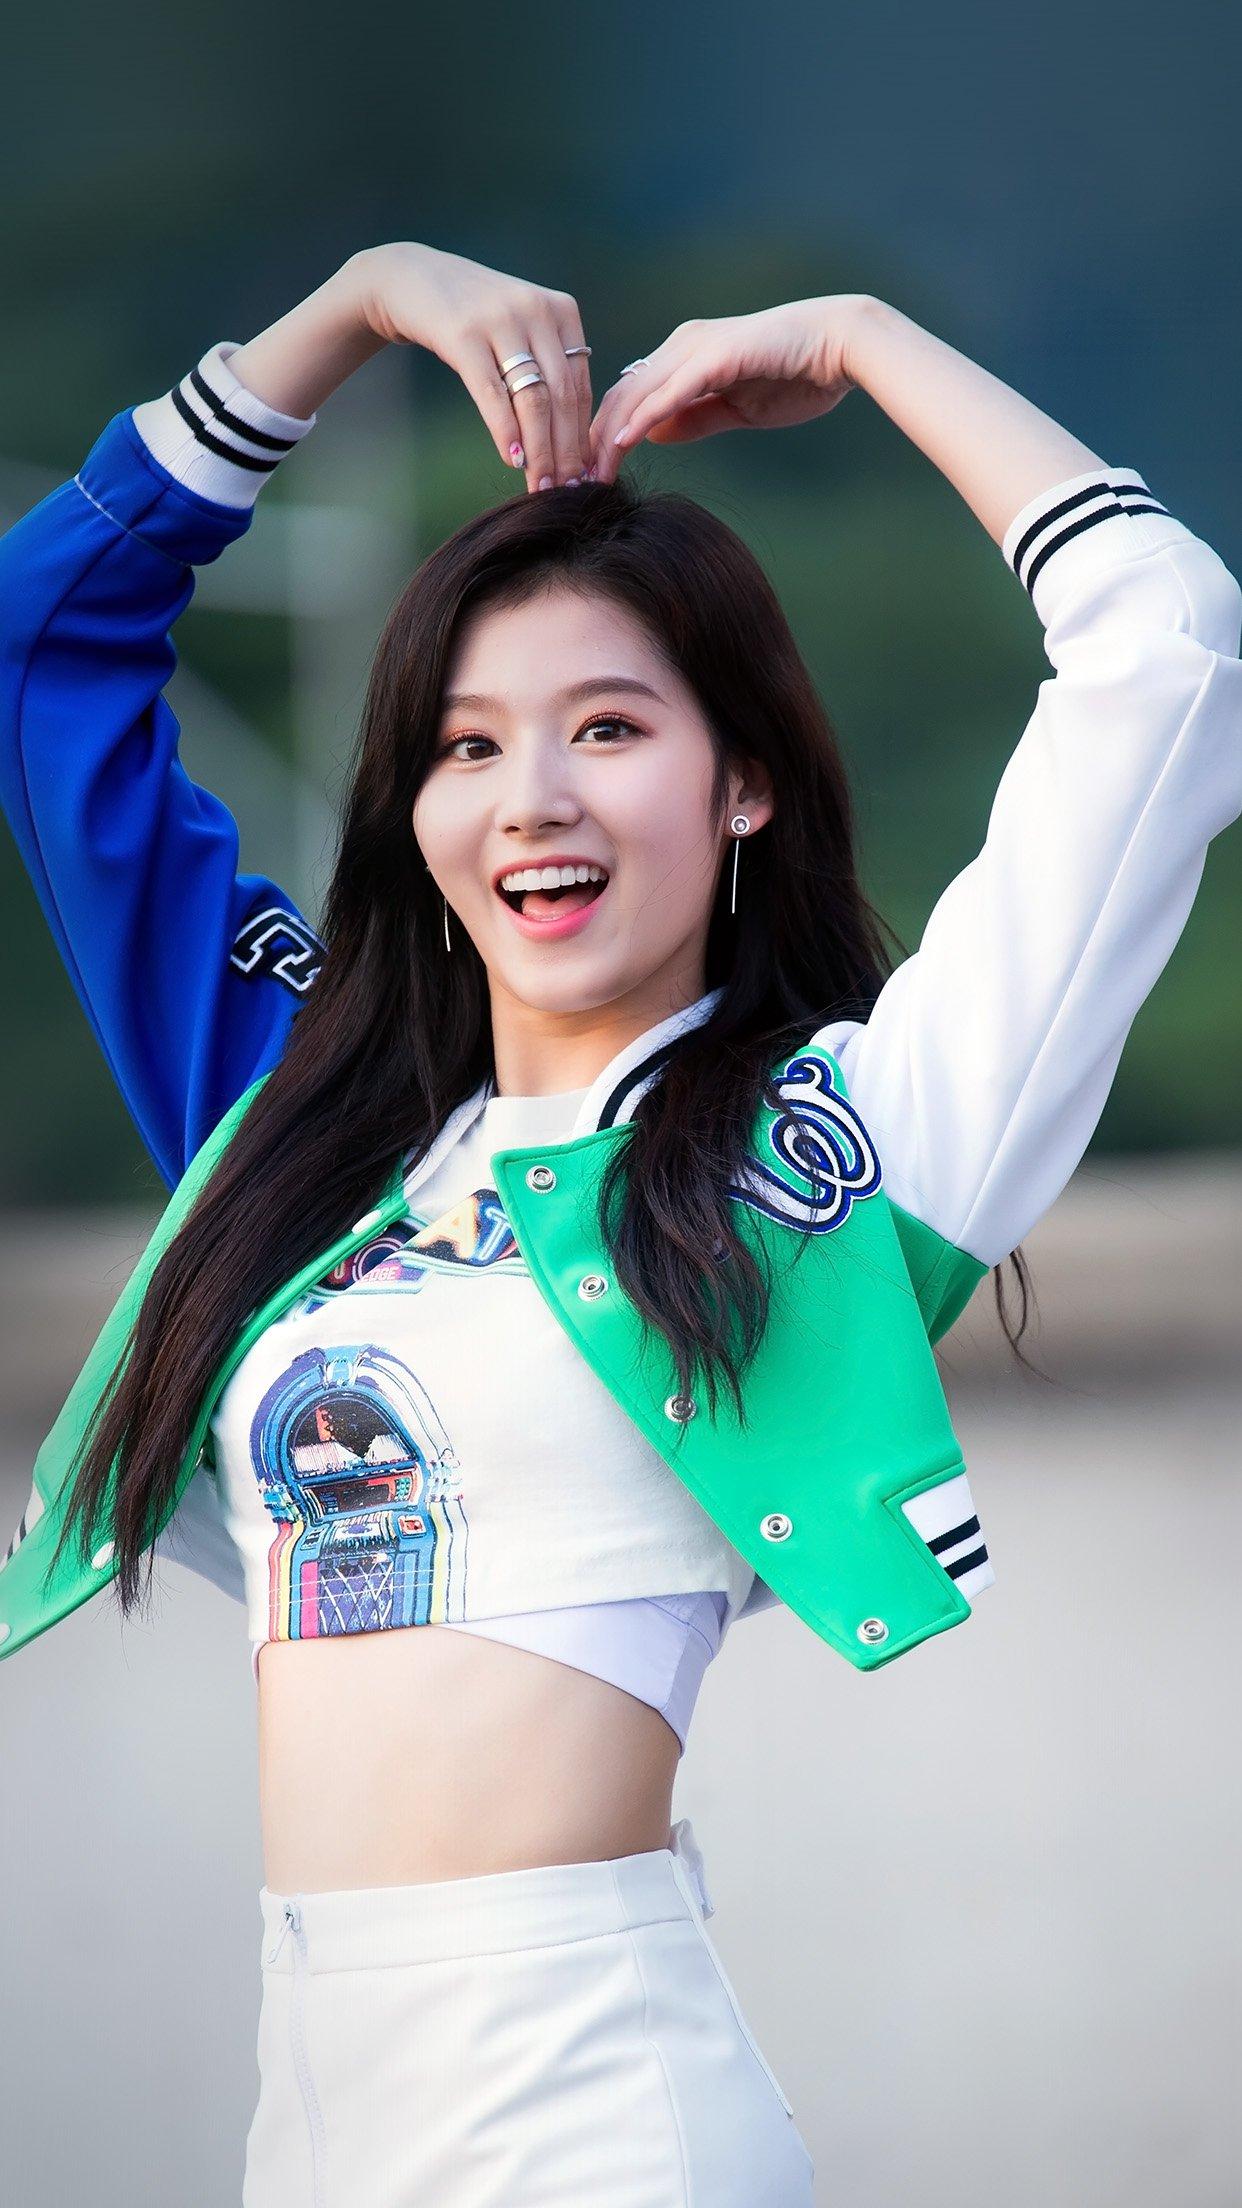 kpop sana heart love cute girl celebrity - wallpapers for iphone